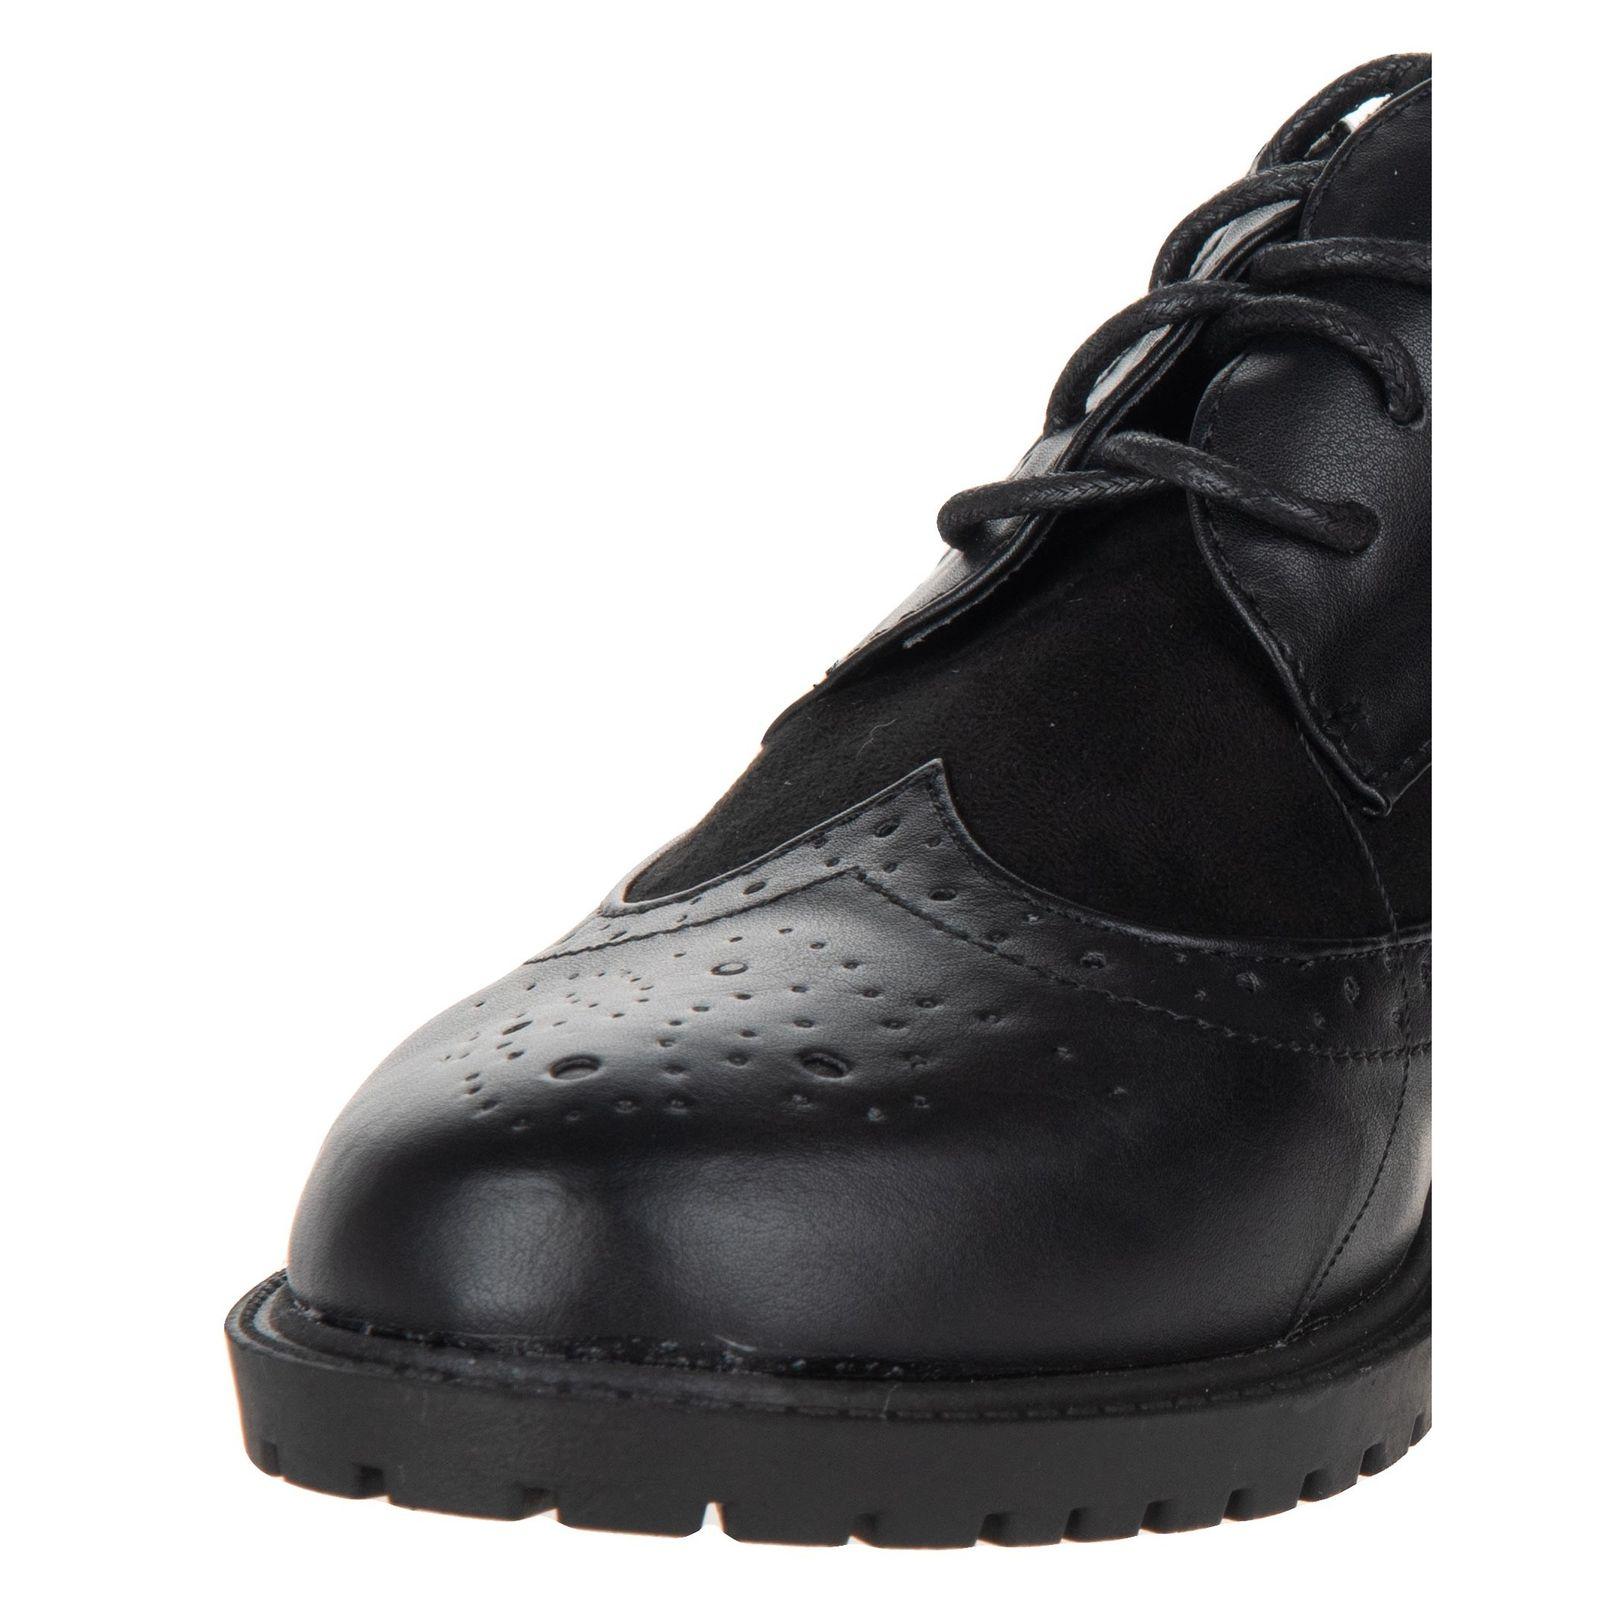 کفش تخت زنانه - مالین - مشکی - 6